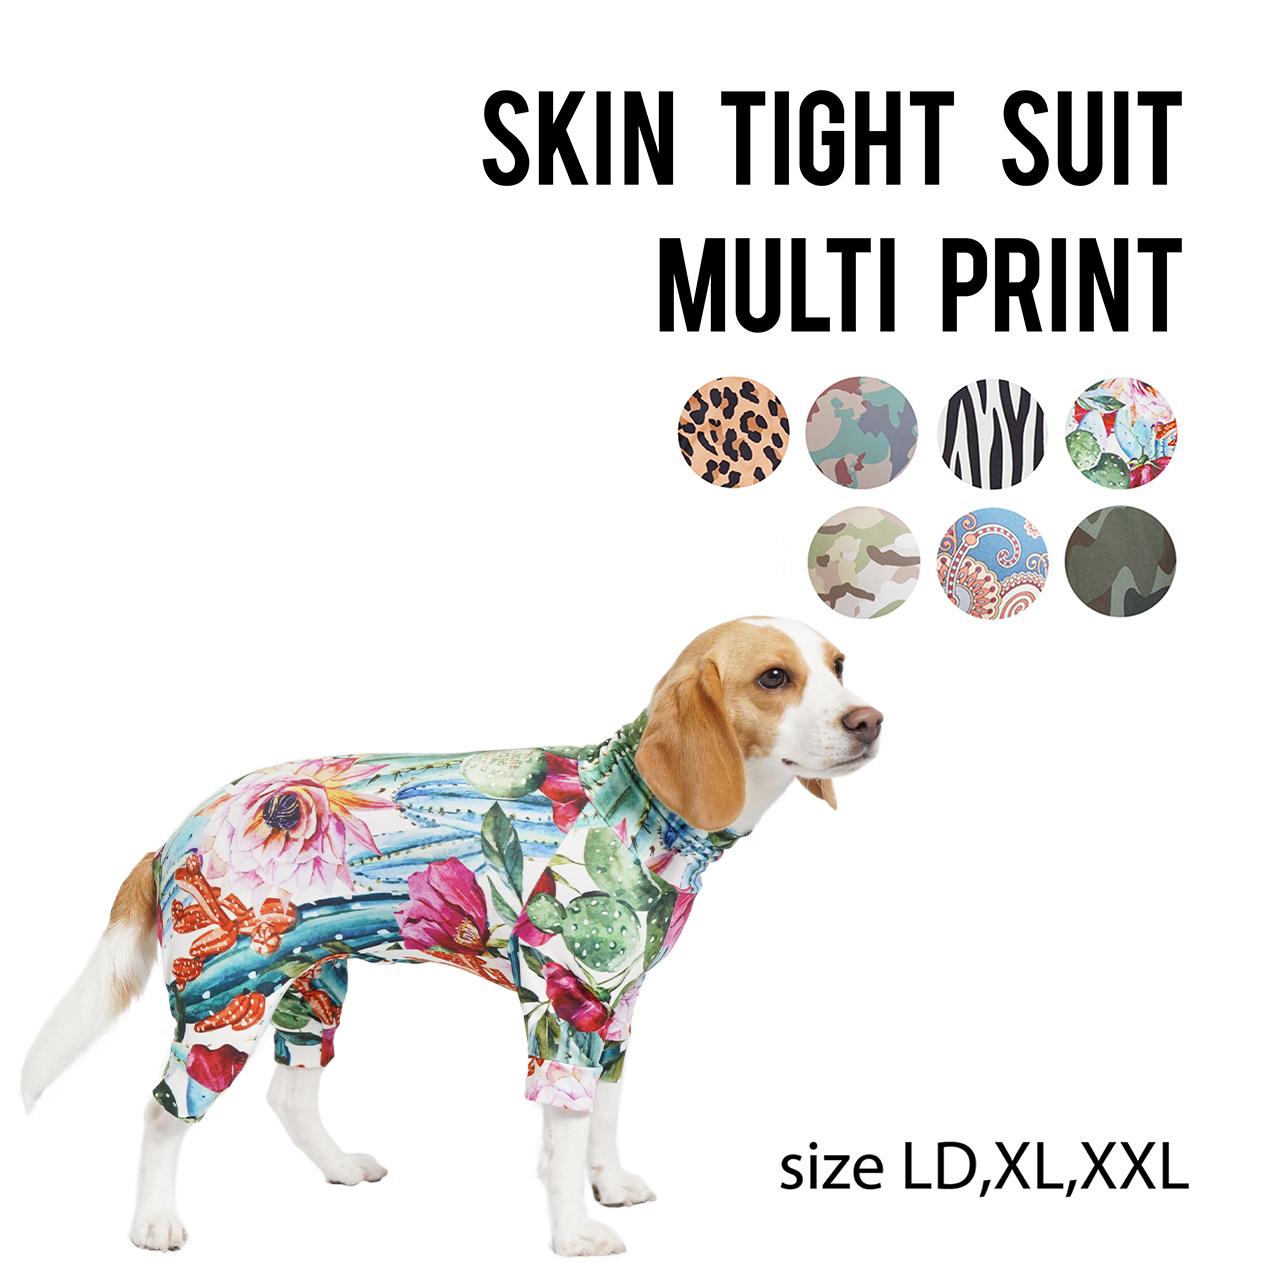 SKIN TIGHT SUIT MULTI PRINT(LD,XL,XXL) スキンタイトスーツマルチプリント